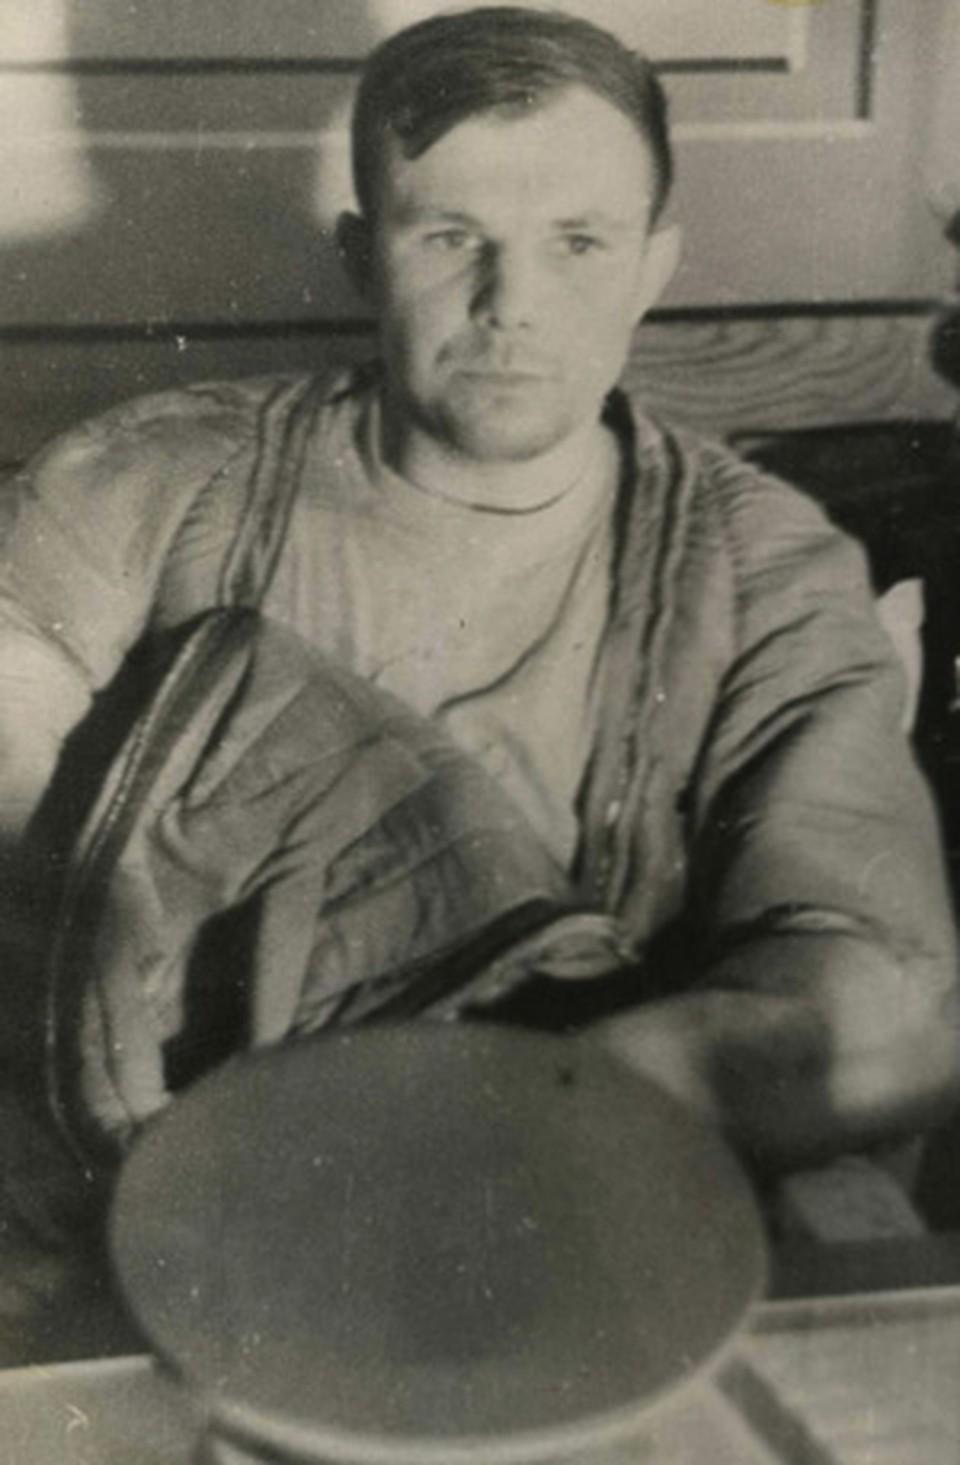 Хрущев настоял, чтобы лейтенанту Гагарину дали сразу звание майора.